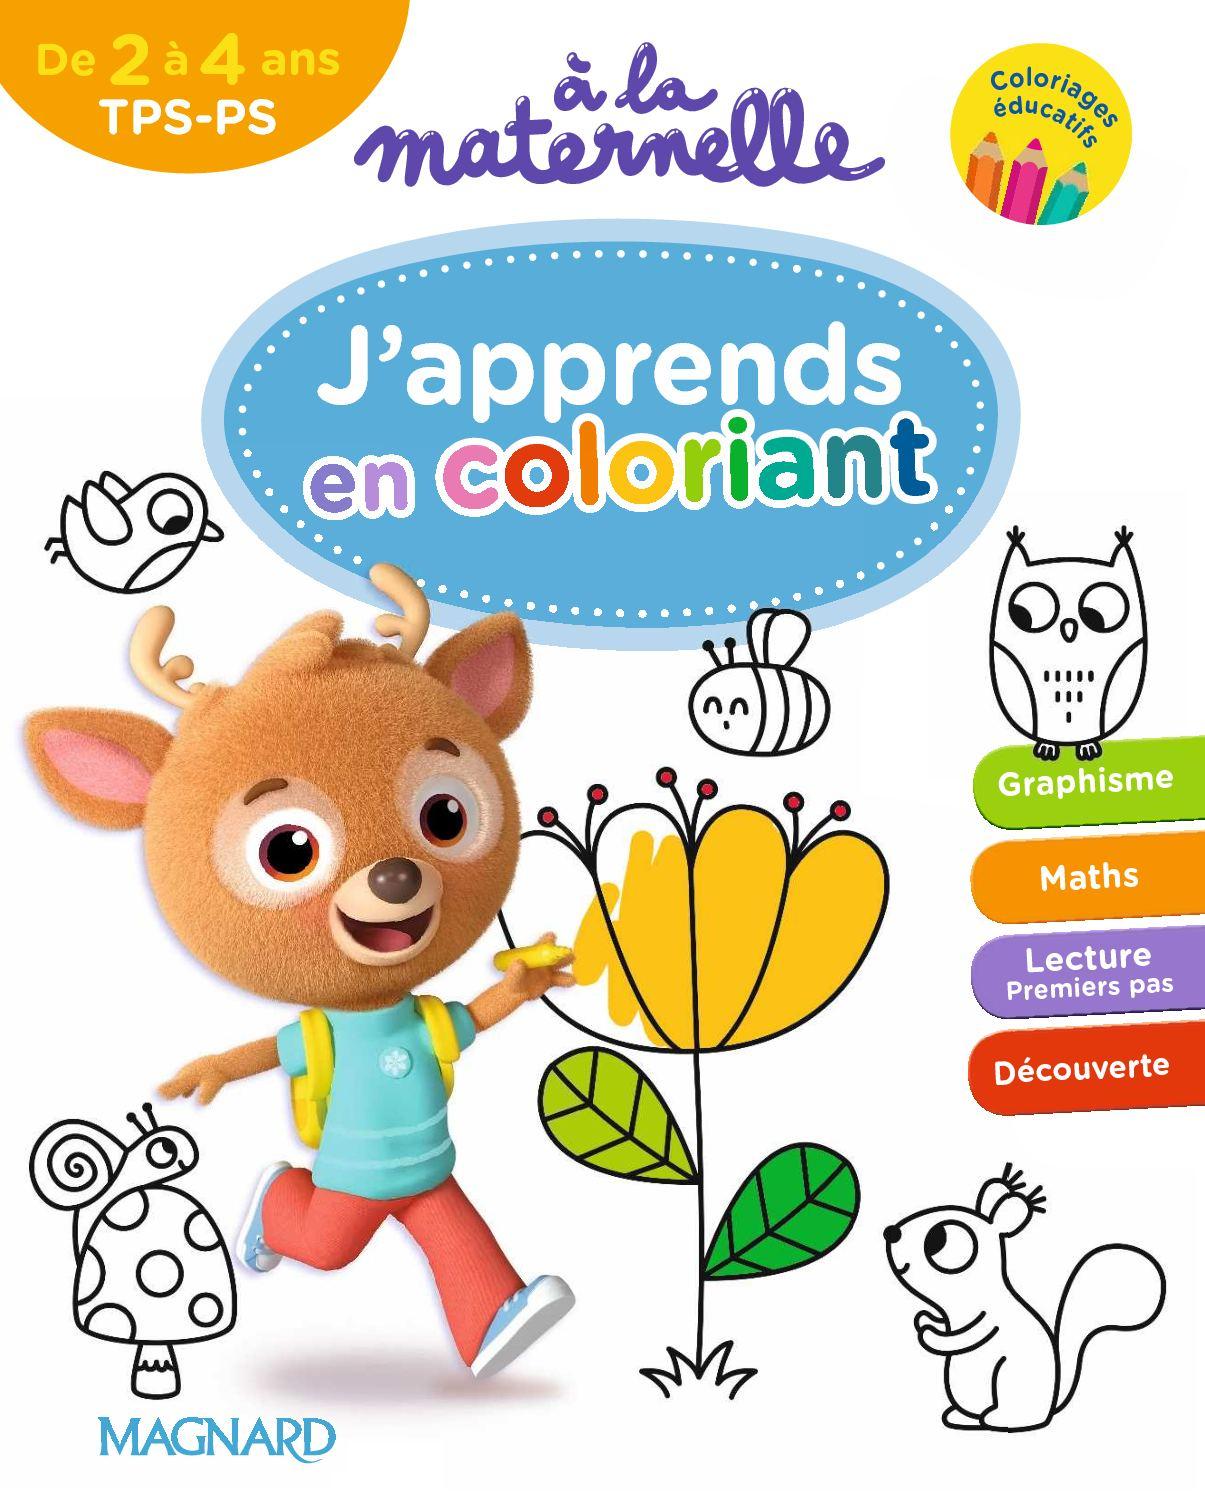 Extrait Coloriages Tps-Ps - Calameo Downloader concernant Coloriage Maternelle Ps